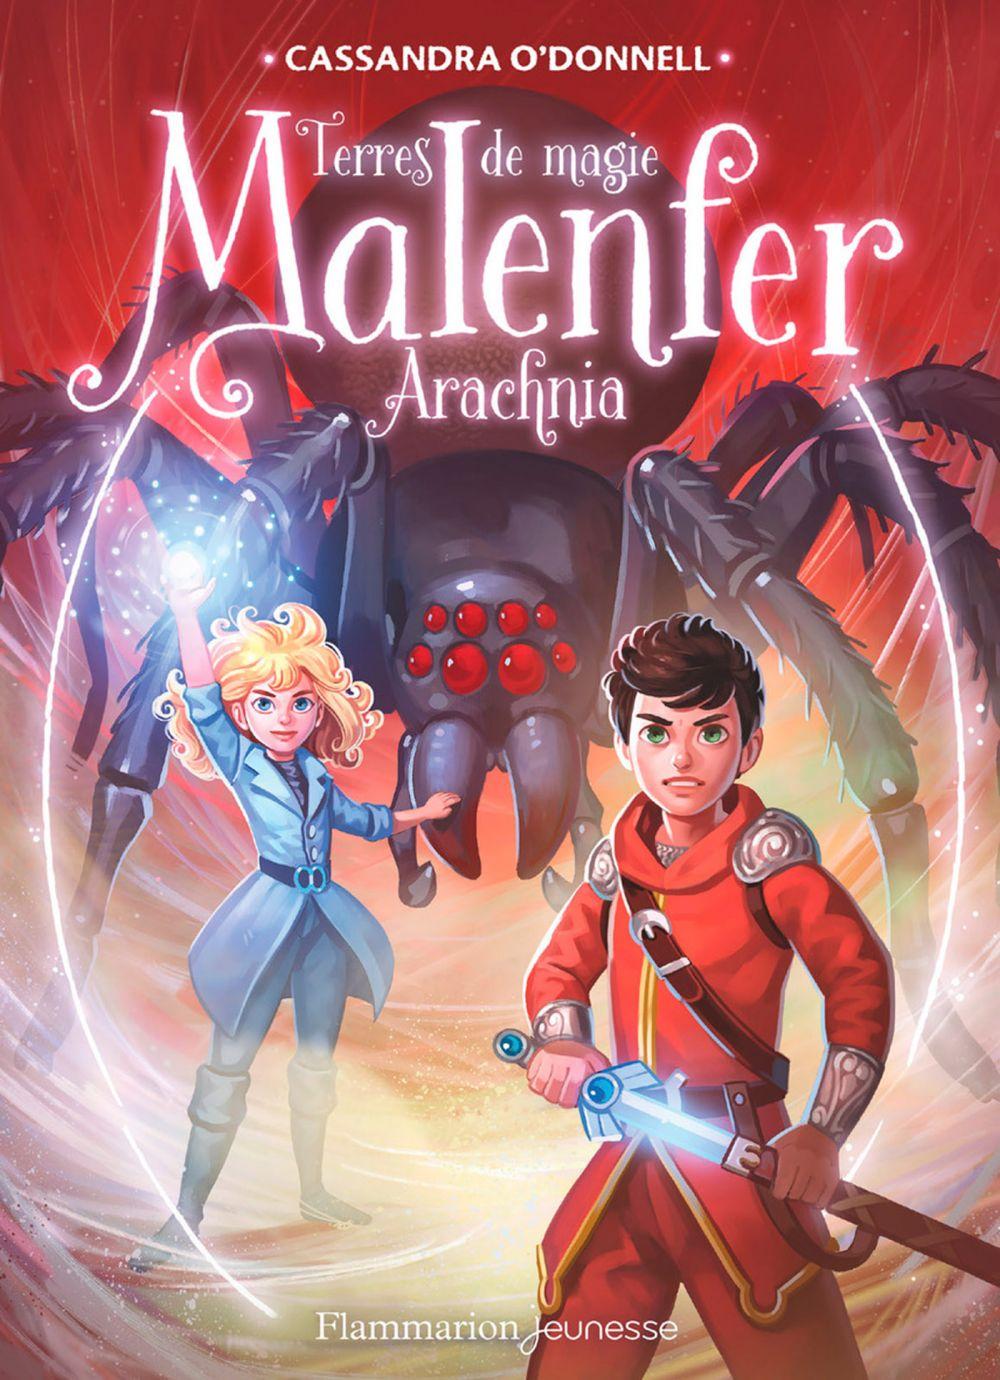 Malenfer - Terres de magie (Tome 6) - Arachnia | O'Donnell, Cassandra. Auteur